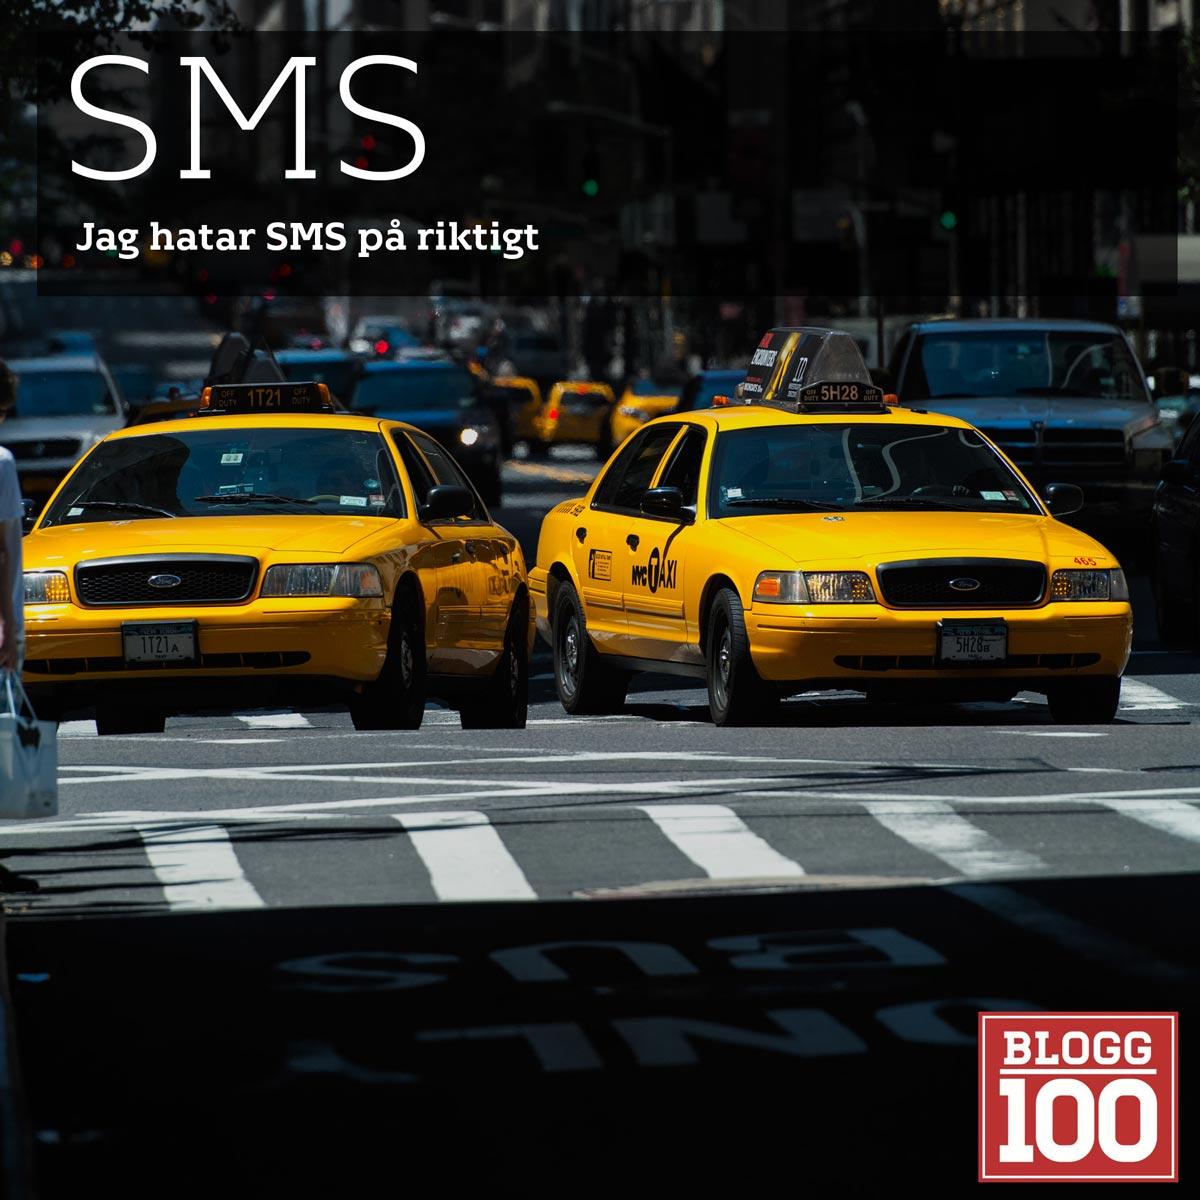 SMS, jag hatar er #blogg100 #fb